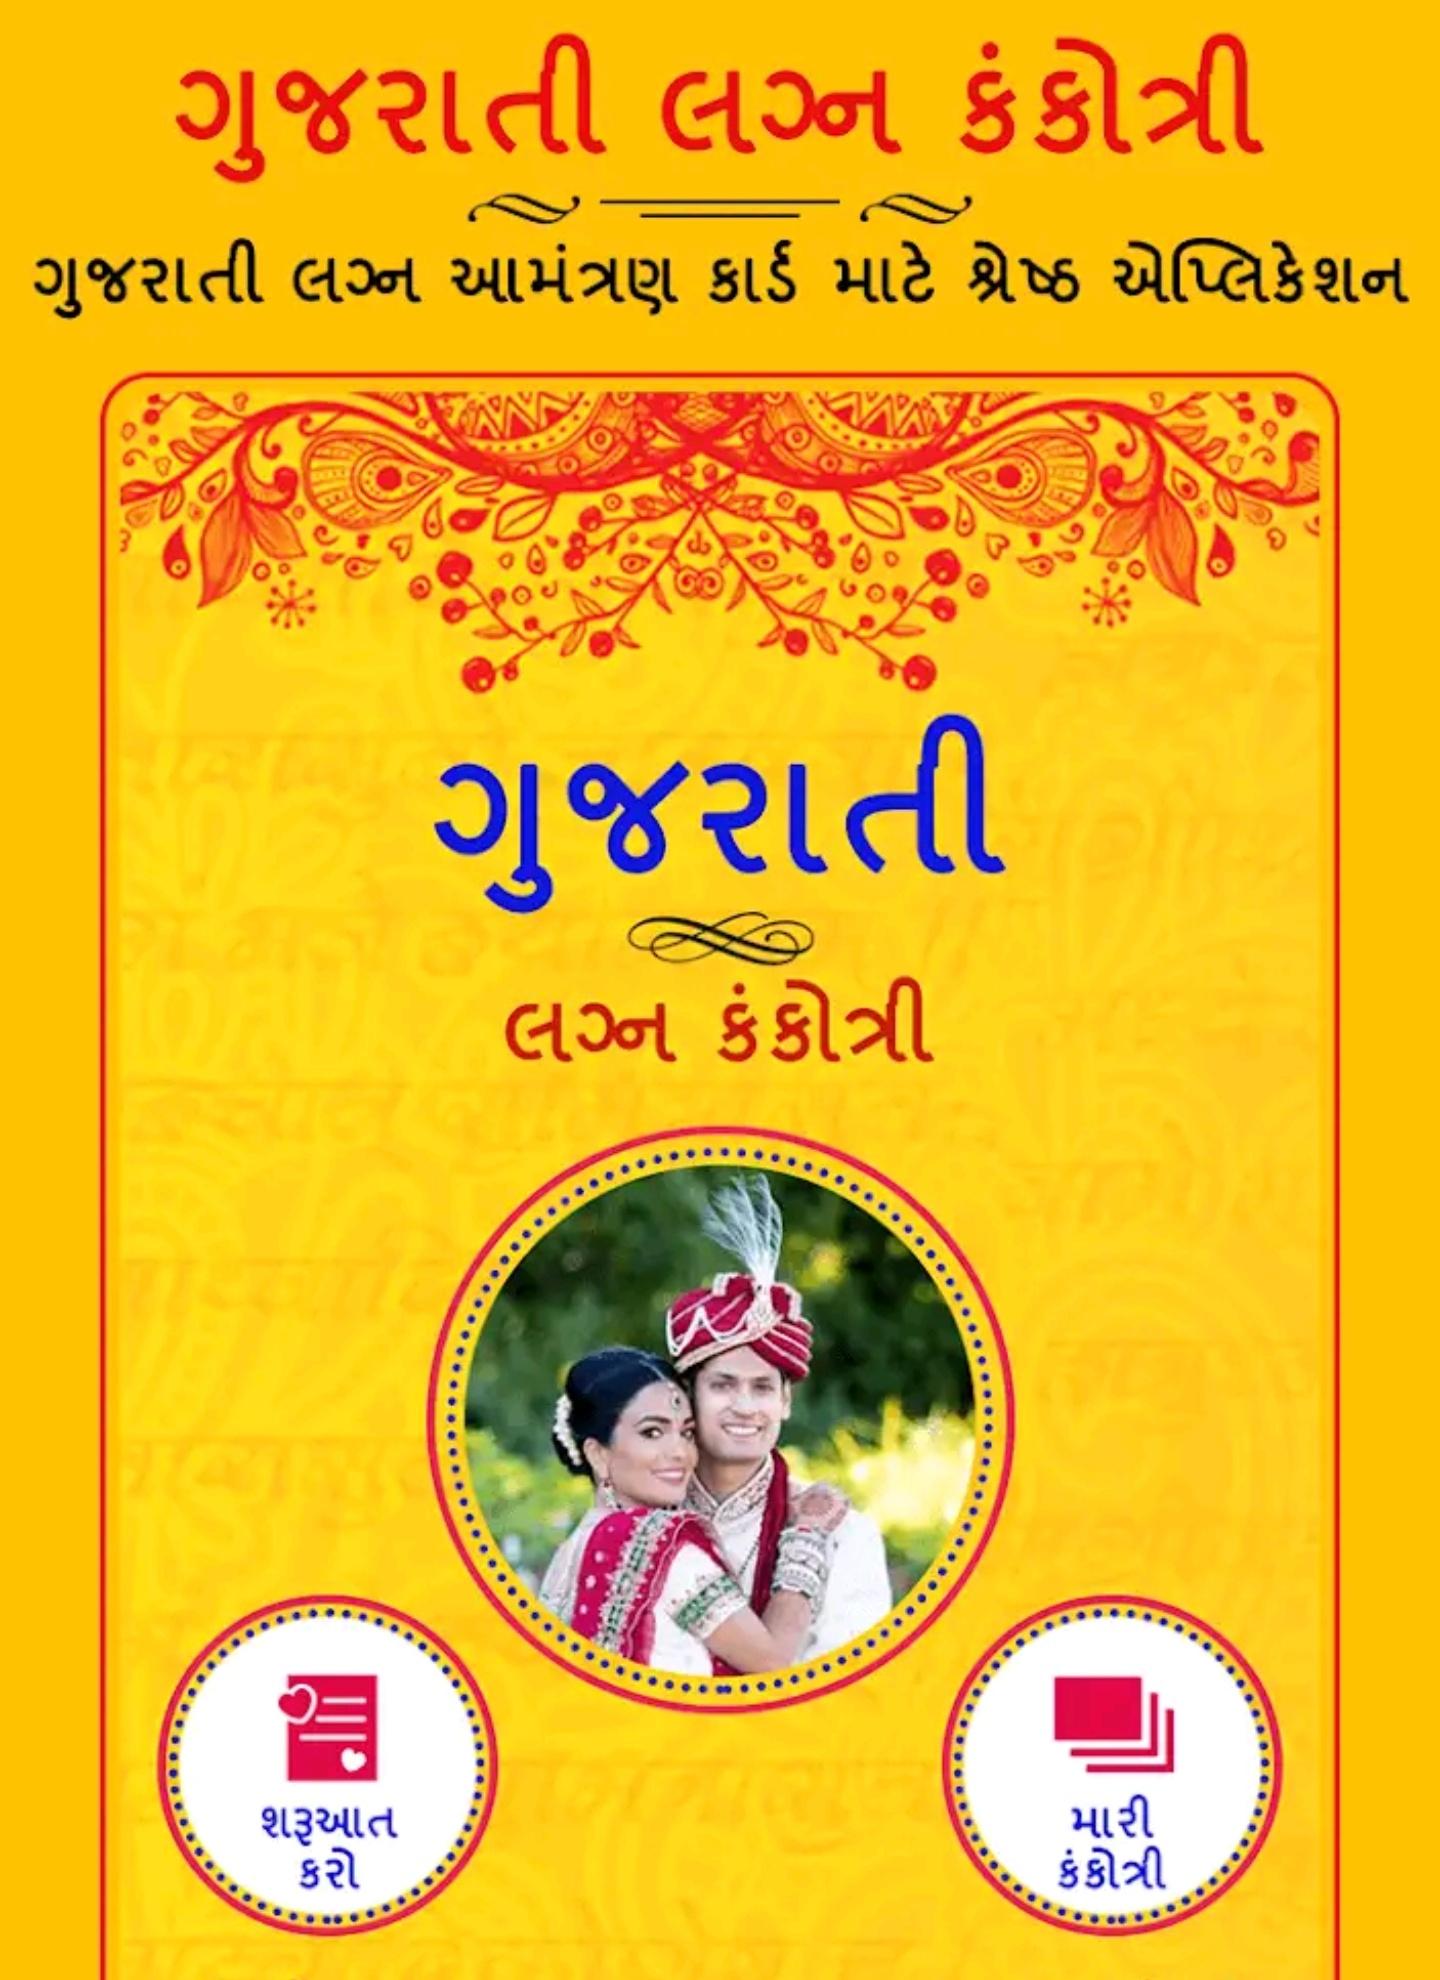 Prepare wedding kankotri now in mobile only in Gujarati language